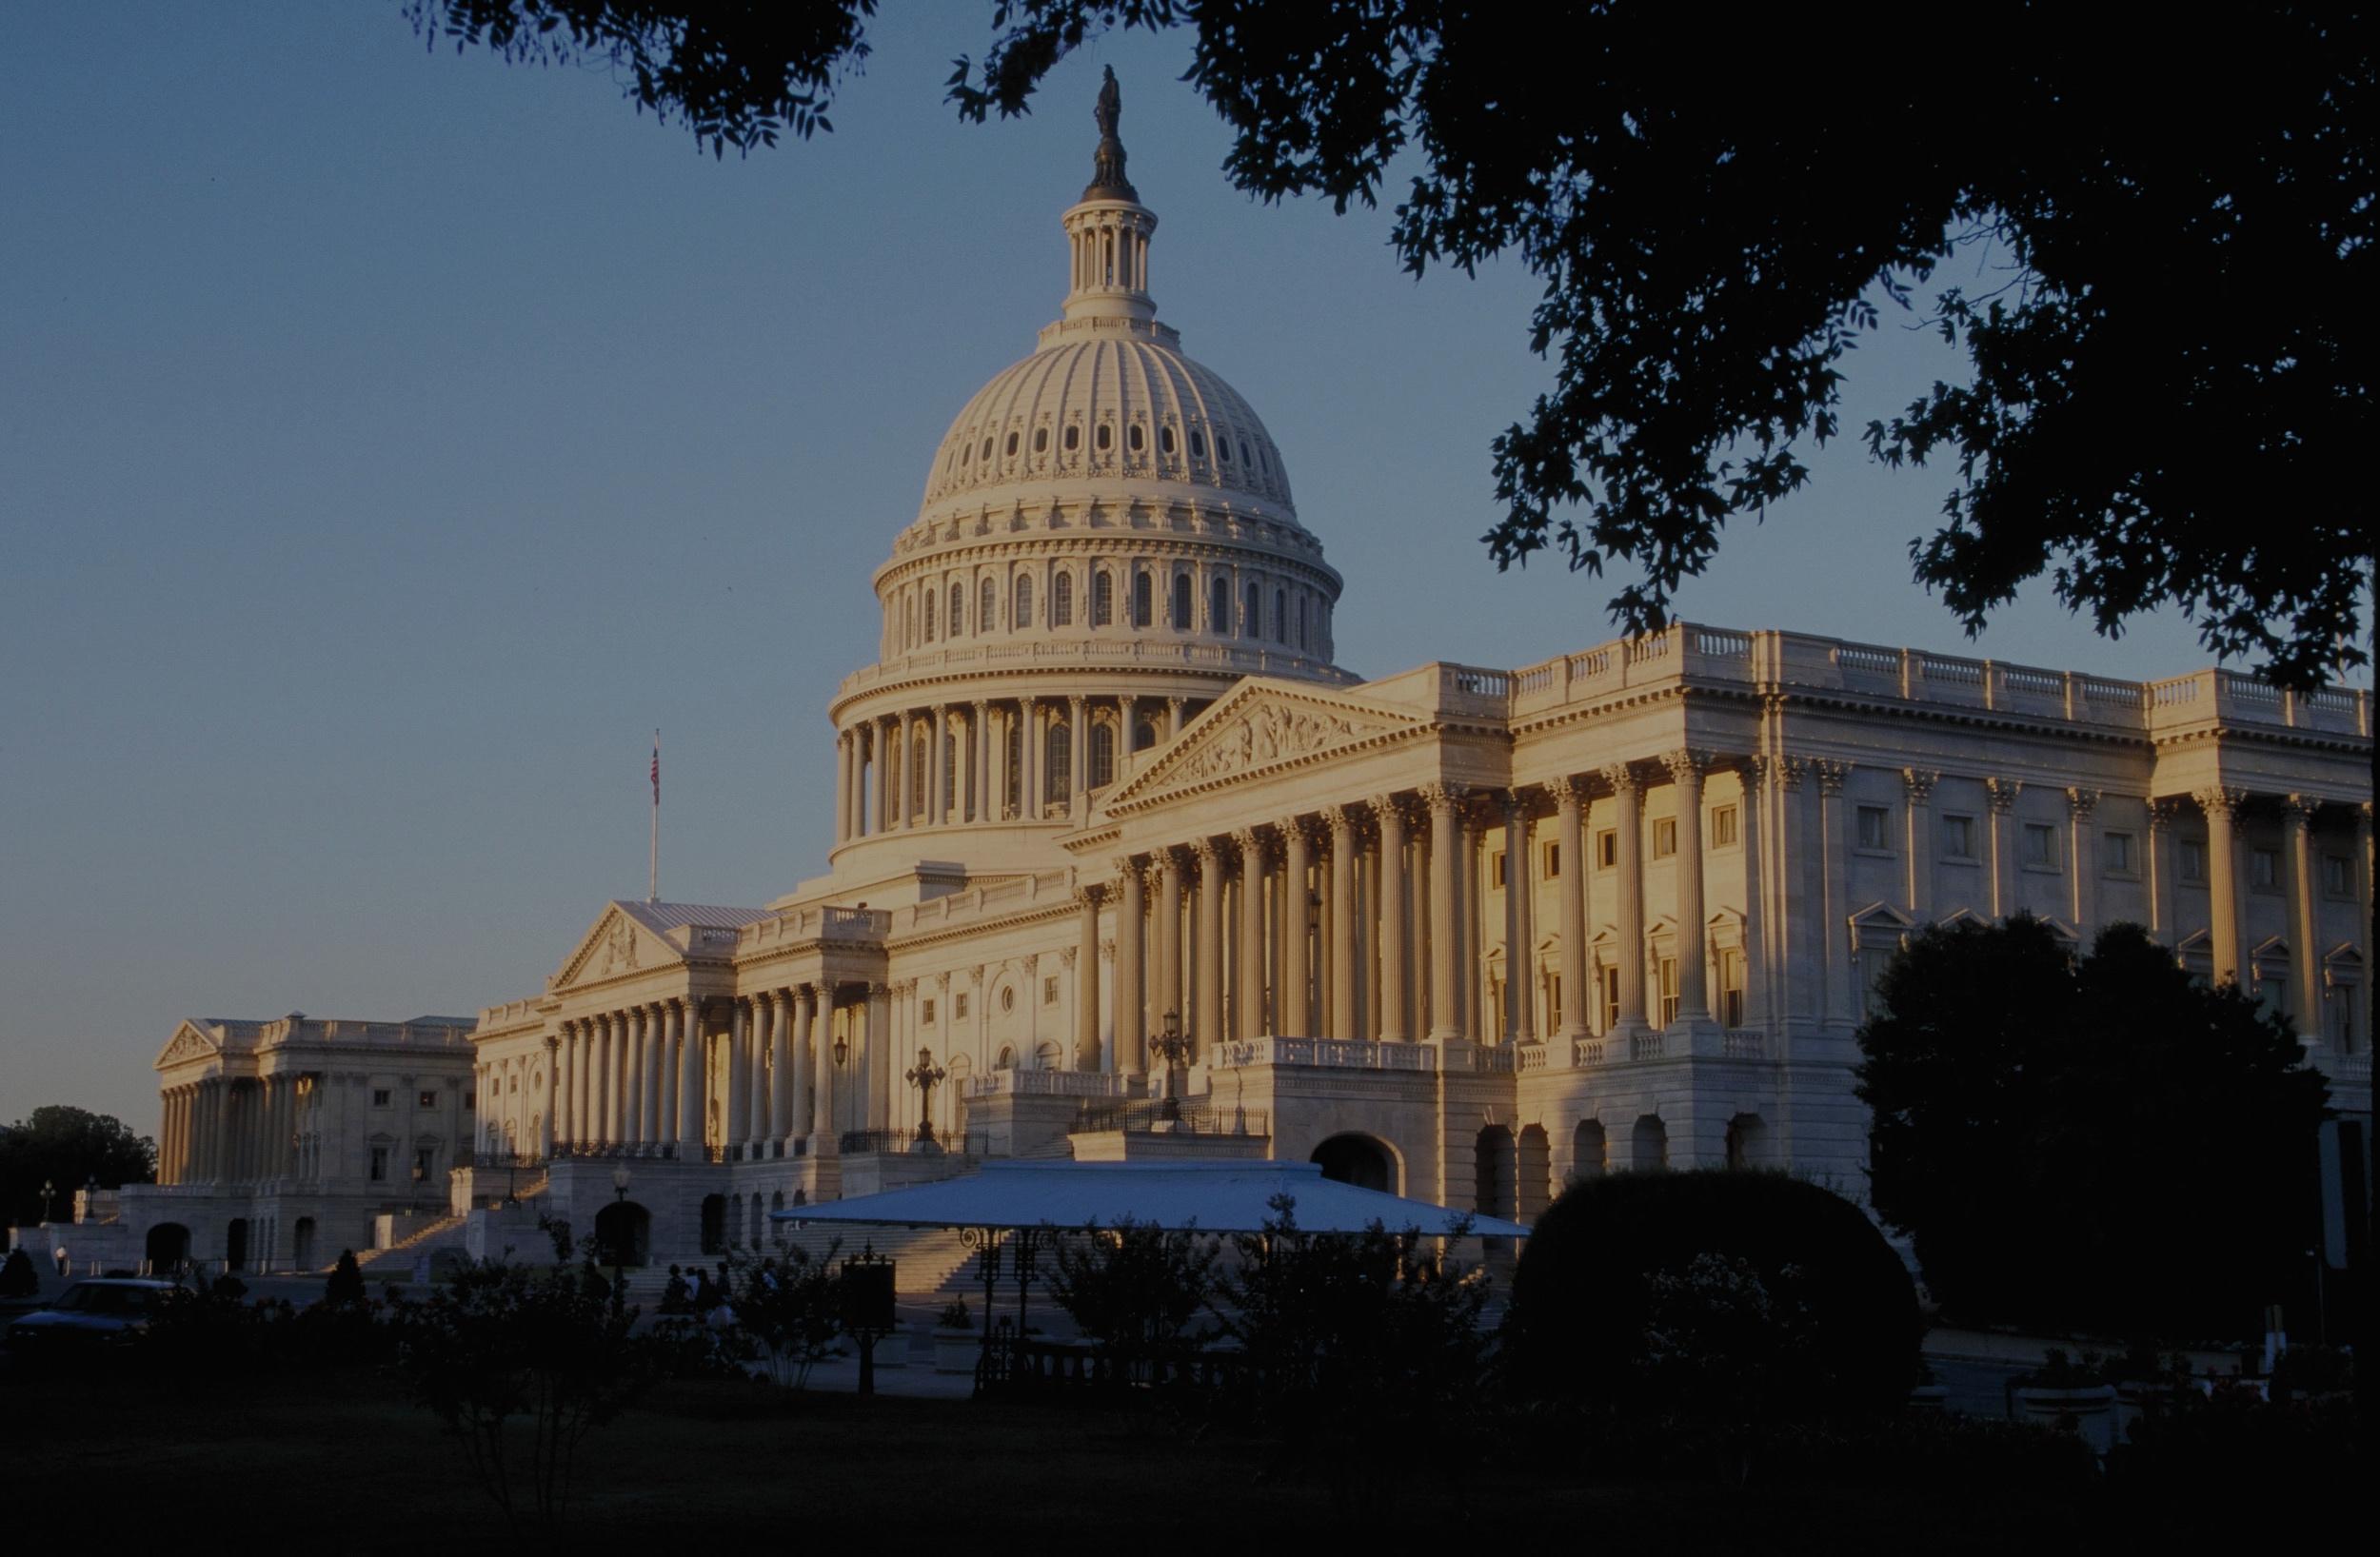 Engage DC Internship Program - Washington, D.C.